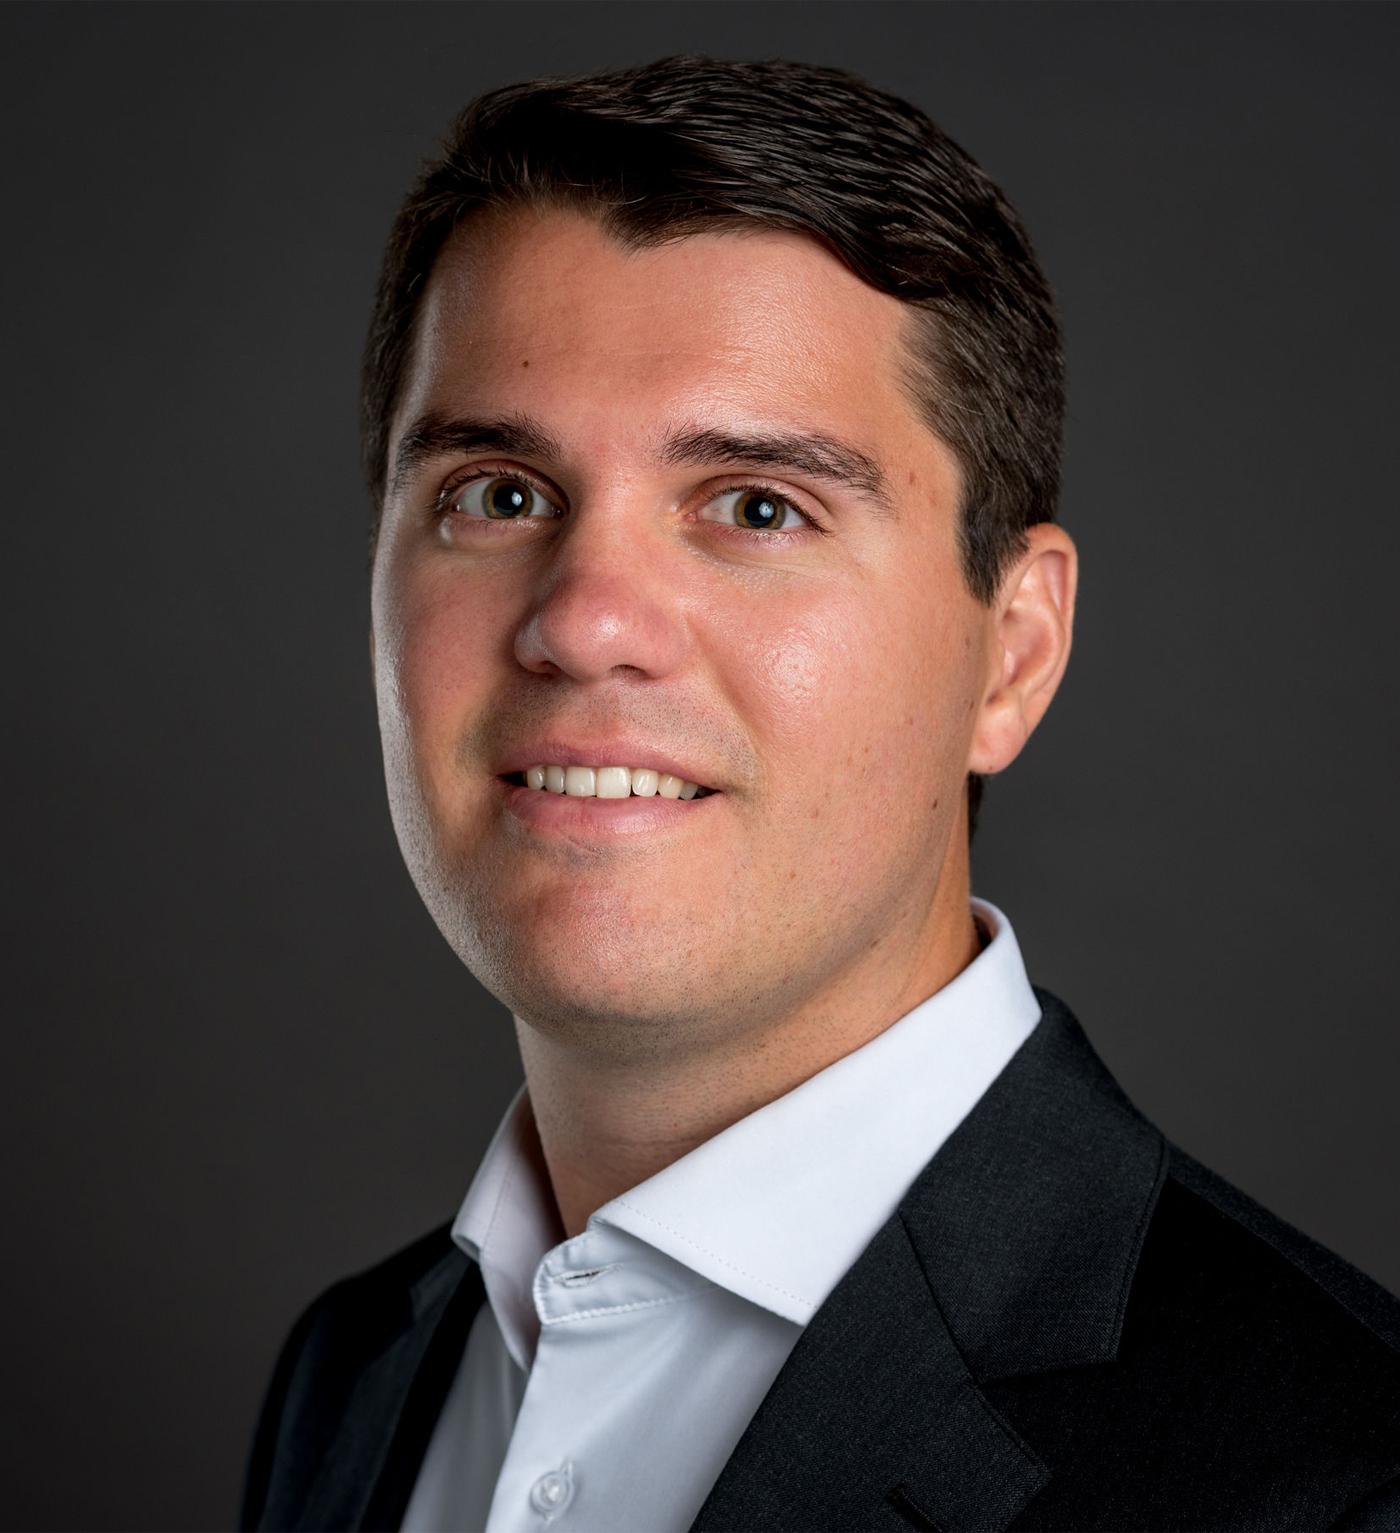 Steve Aitken Headshot | Dakota Investments